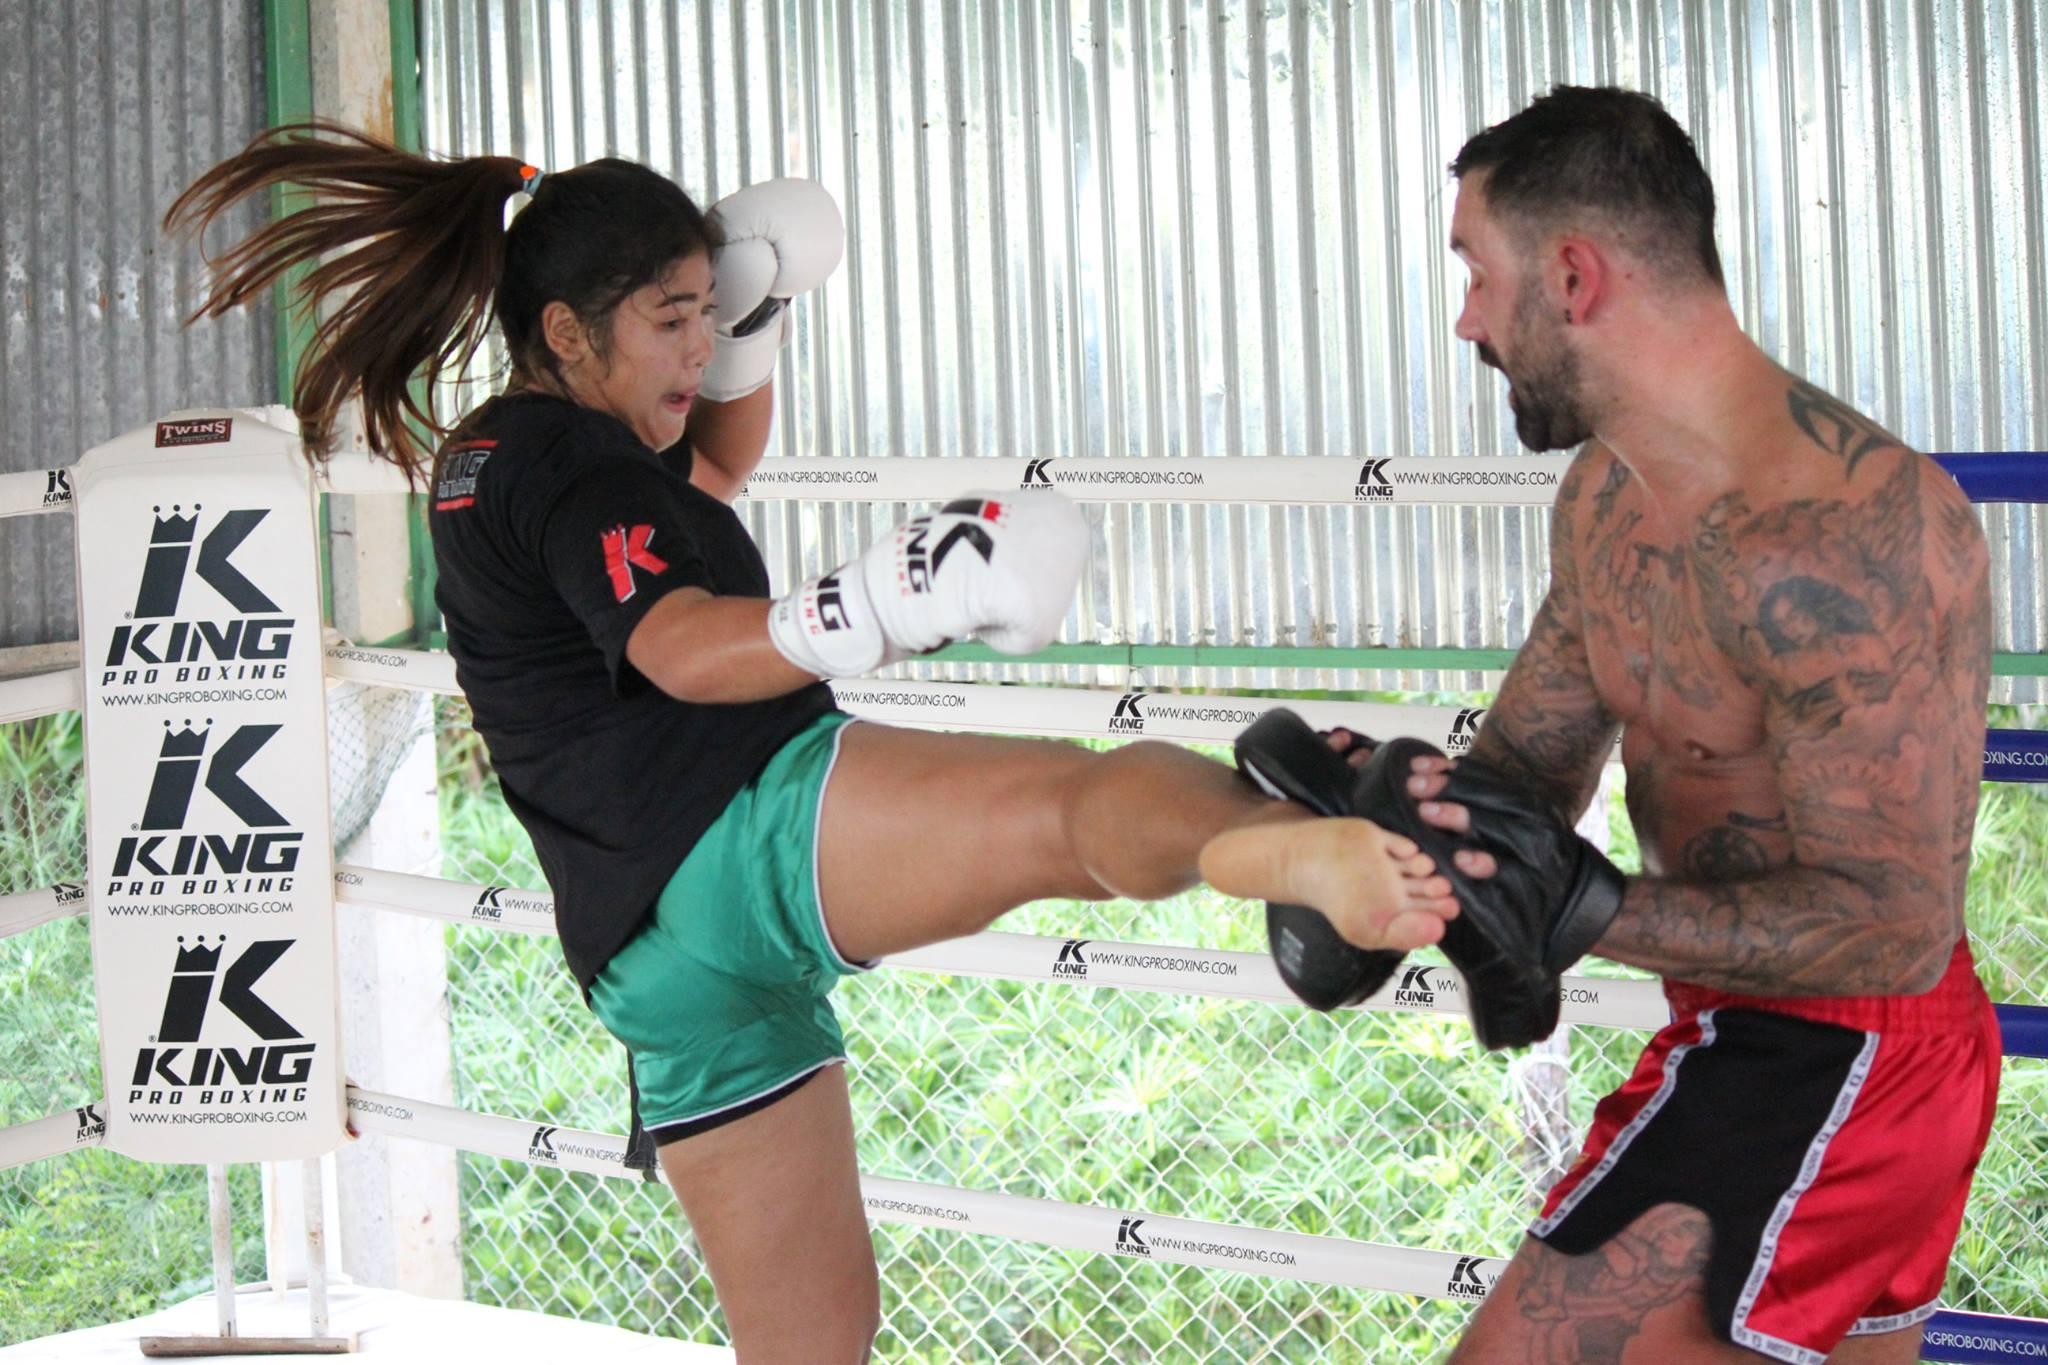 Лапы тренера - Boxing Mitts - King Pro Boxing Большие  Королевство Таиланд